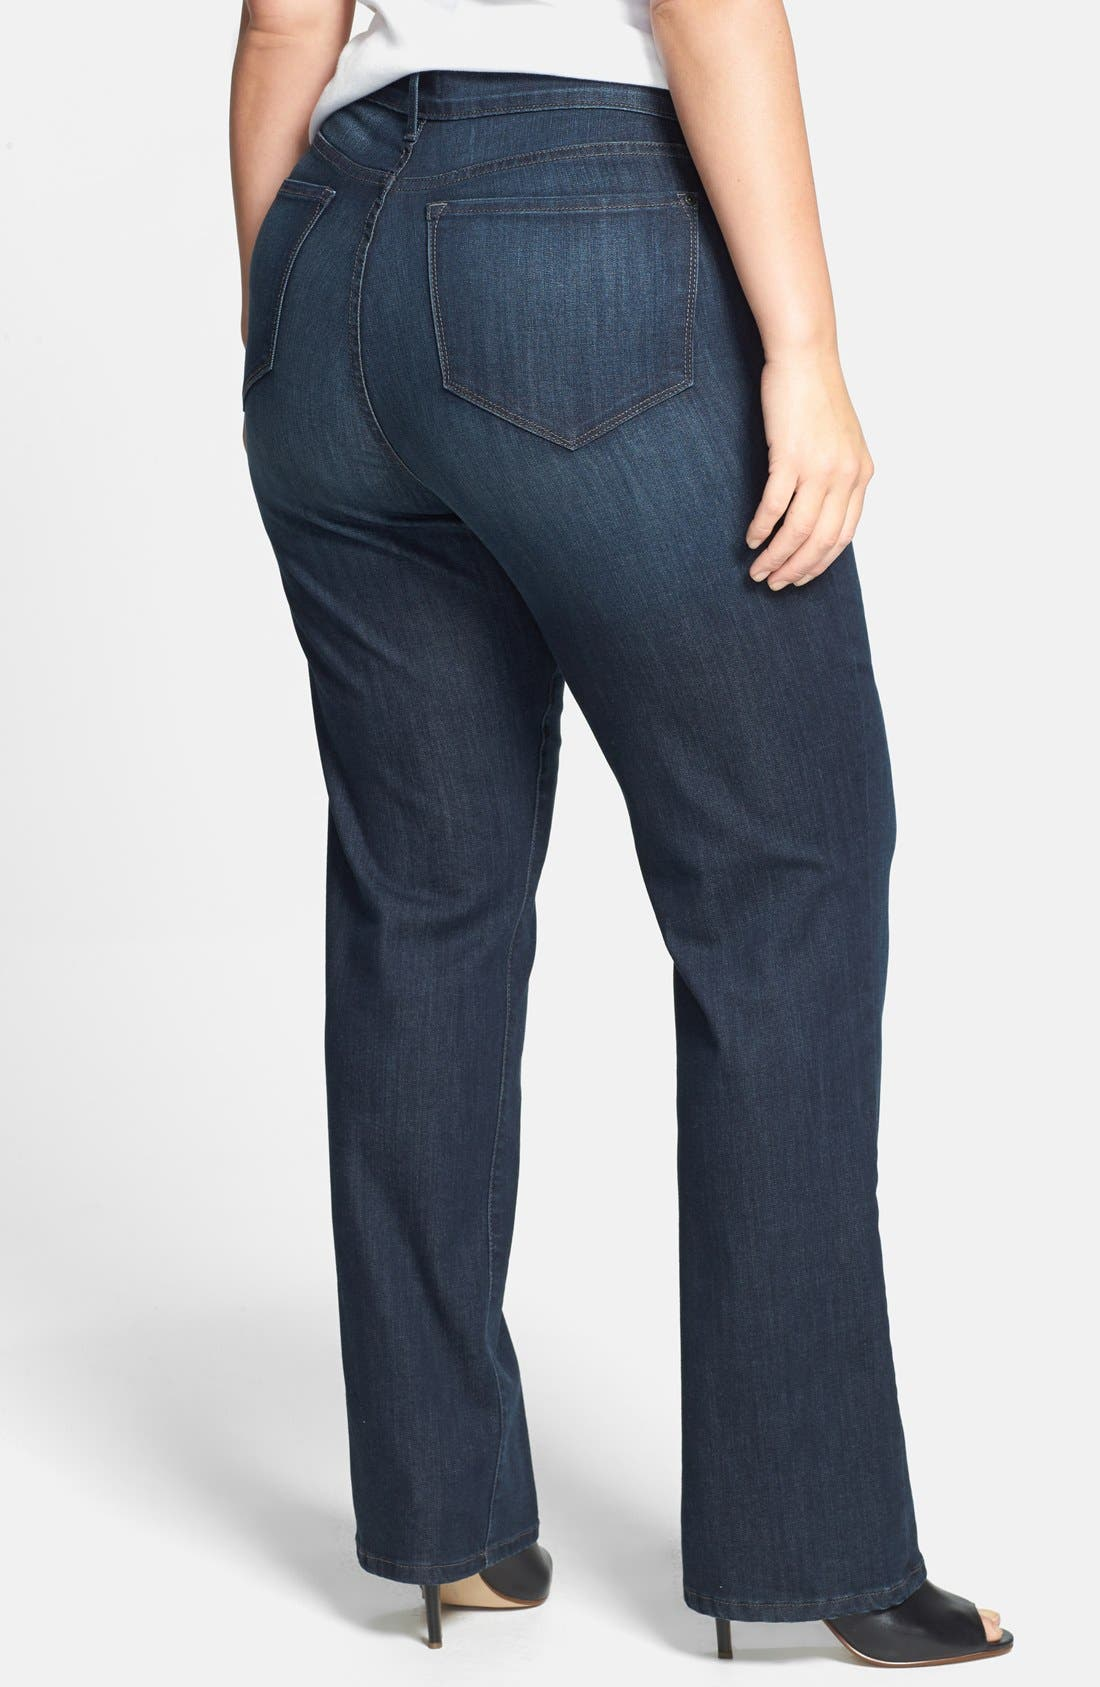 Alternate Image 2  - NYDJ 'Marilyn' Stretch Straight Leg Jeans (Harrington) (Plus Size)